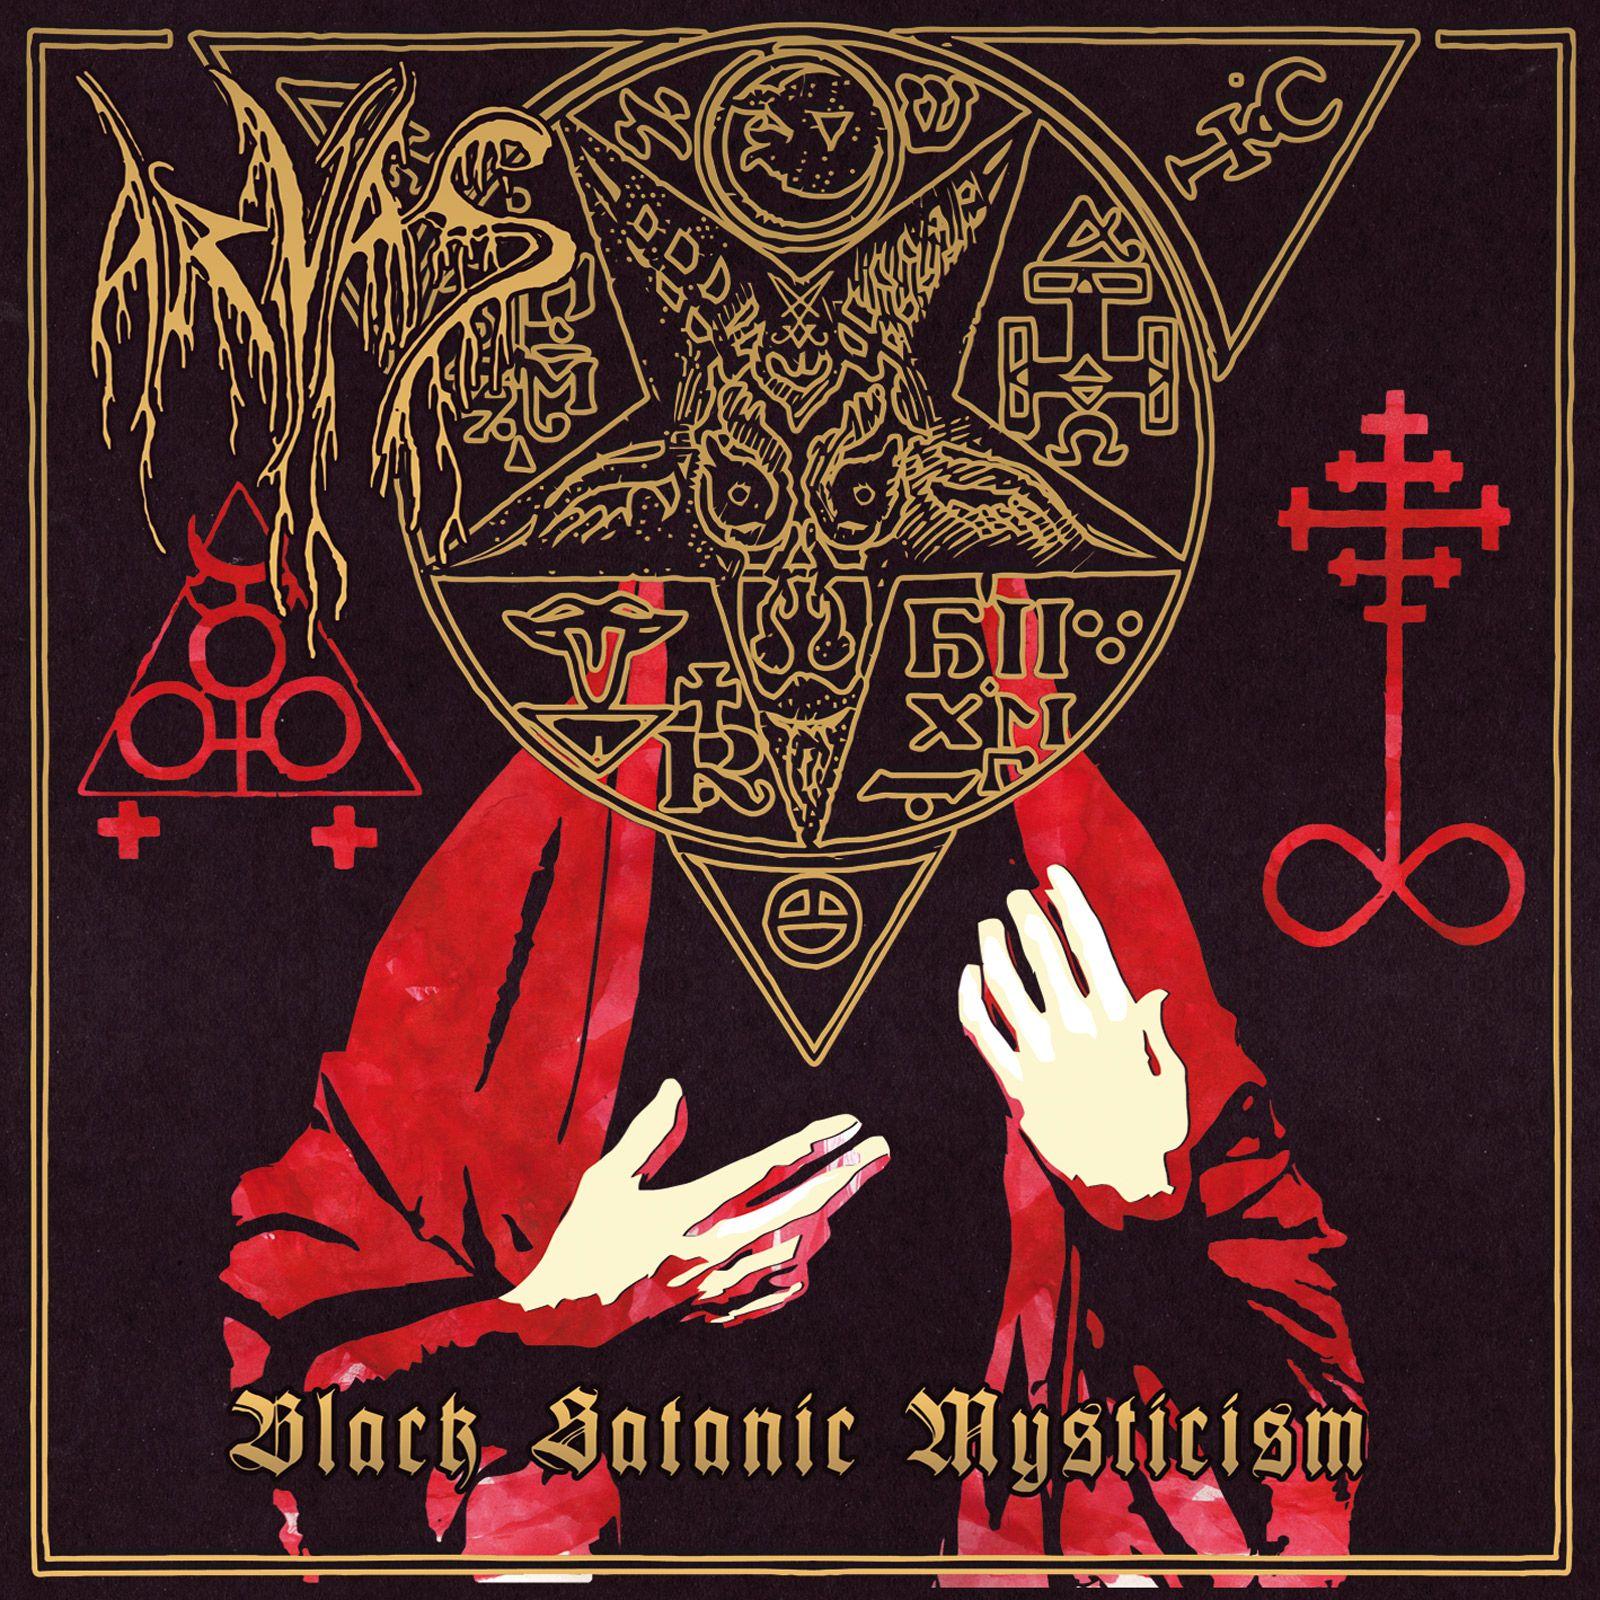 Review for Arvas - Black Satanic Mysticism